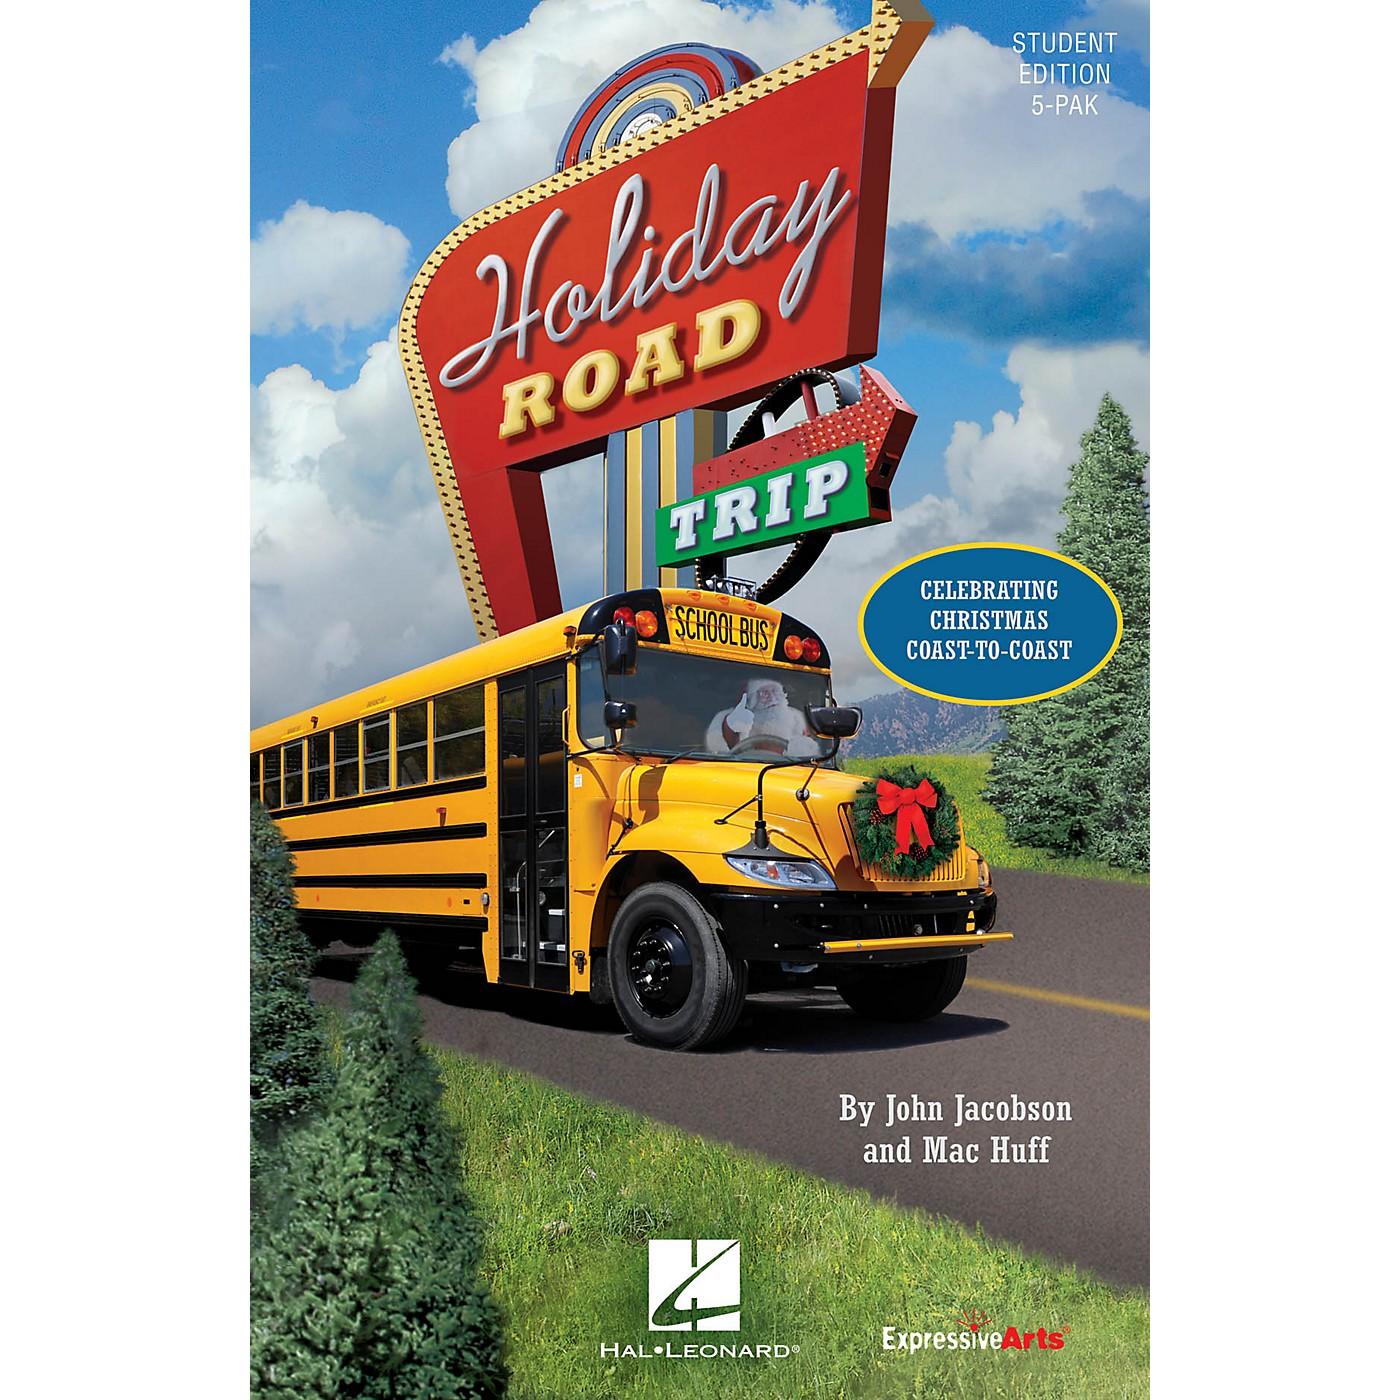 Hal Leonard Holiday Road Trip (Celebrating Christmas Coast-to-Coast) Singer 5 Pak Composed by John Jacobson thumbnail